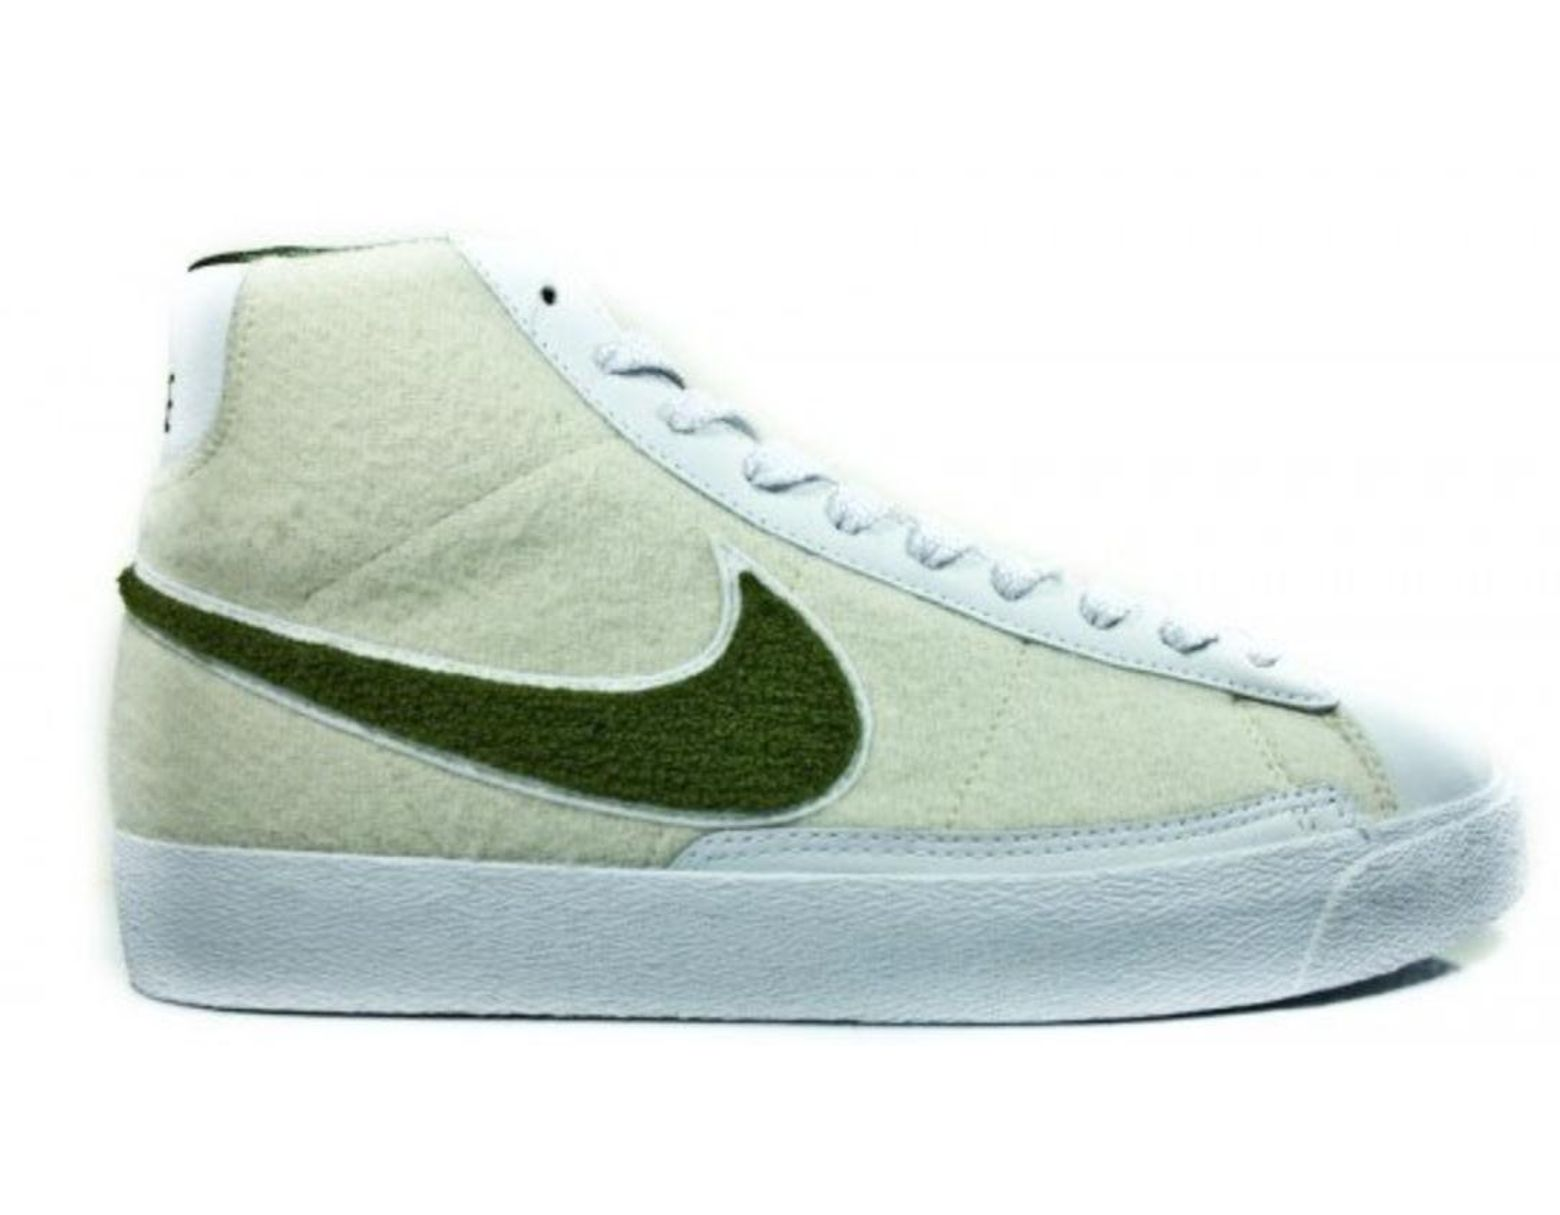 separation shoes 82b7e ff8d2 Men's Green Sb Blazer Stussy Vapor